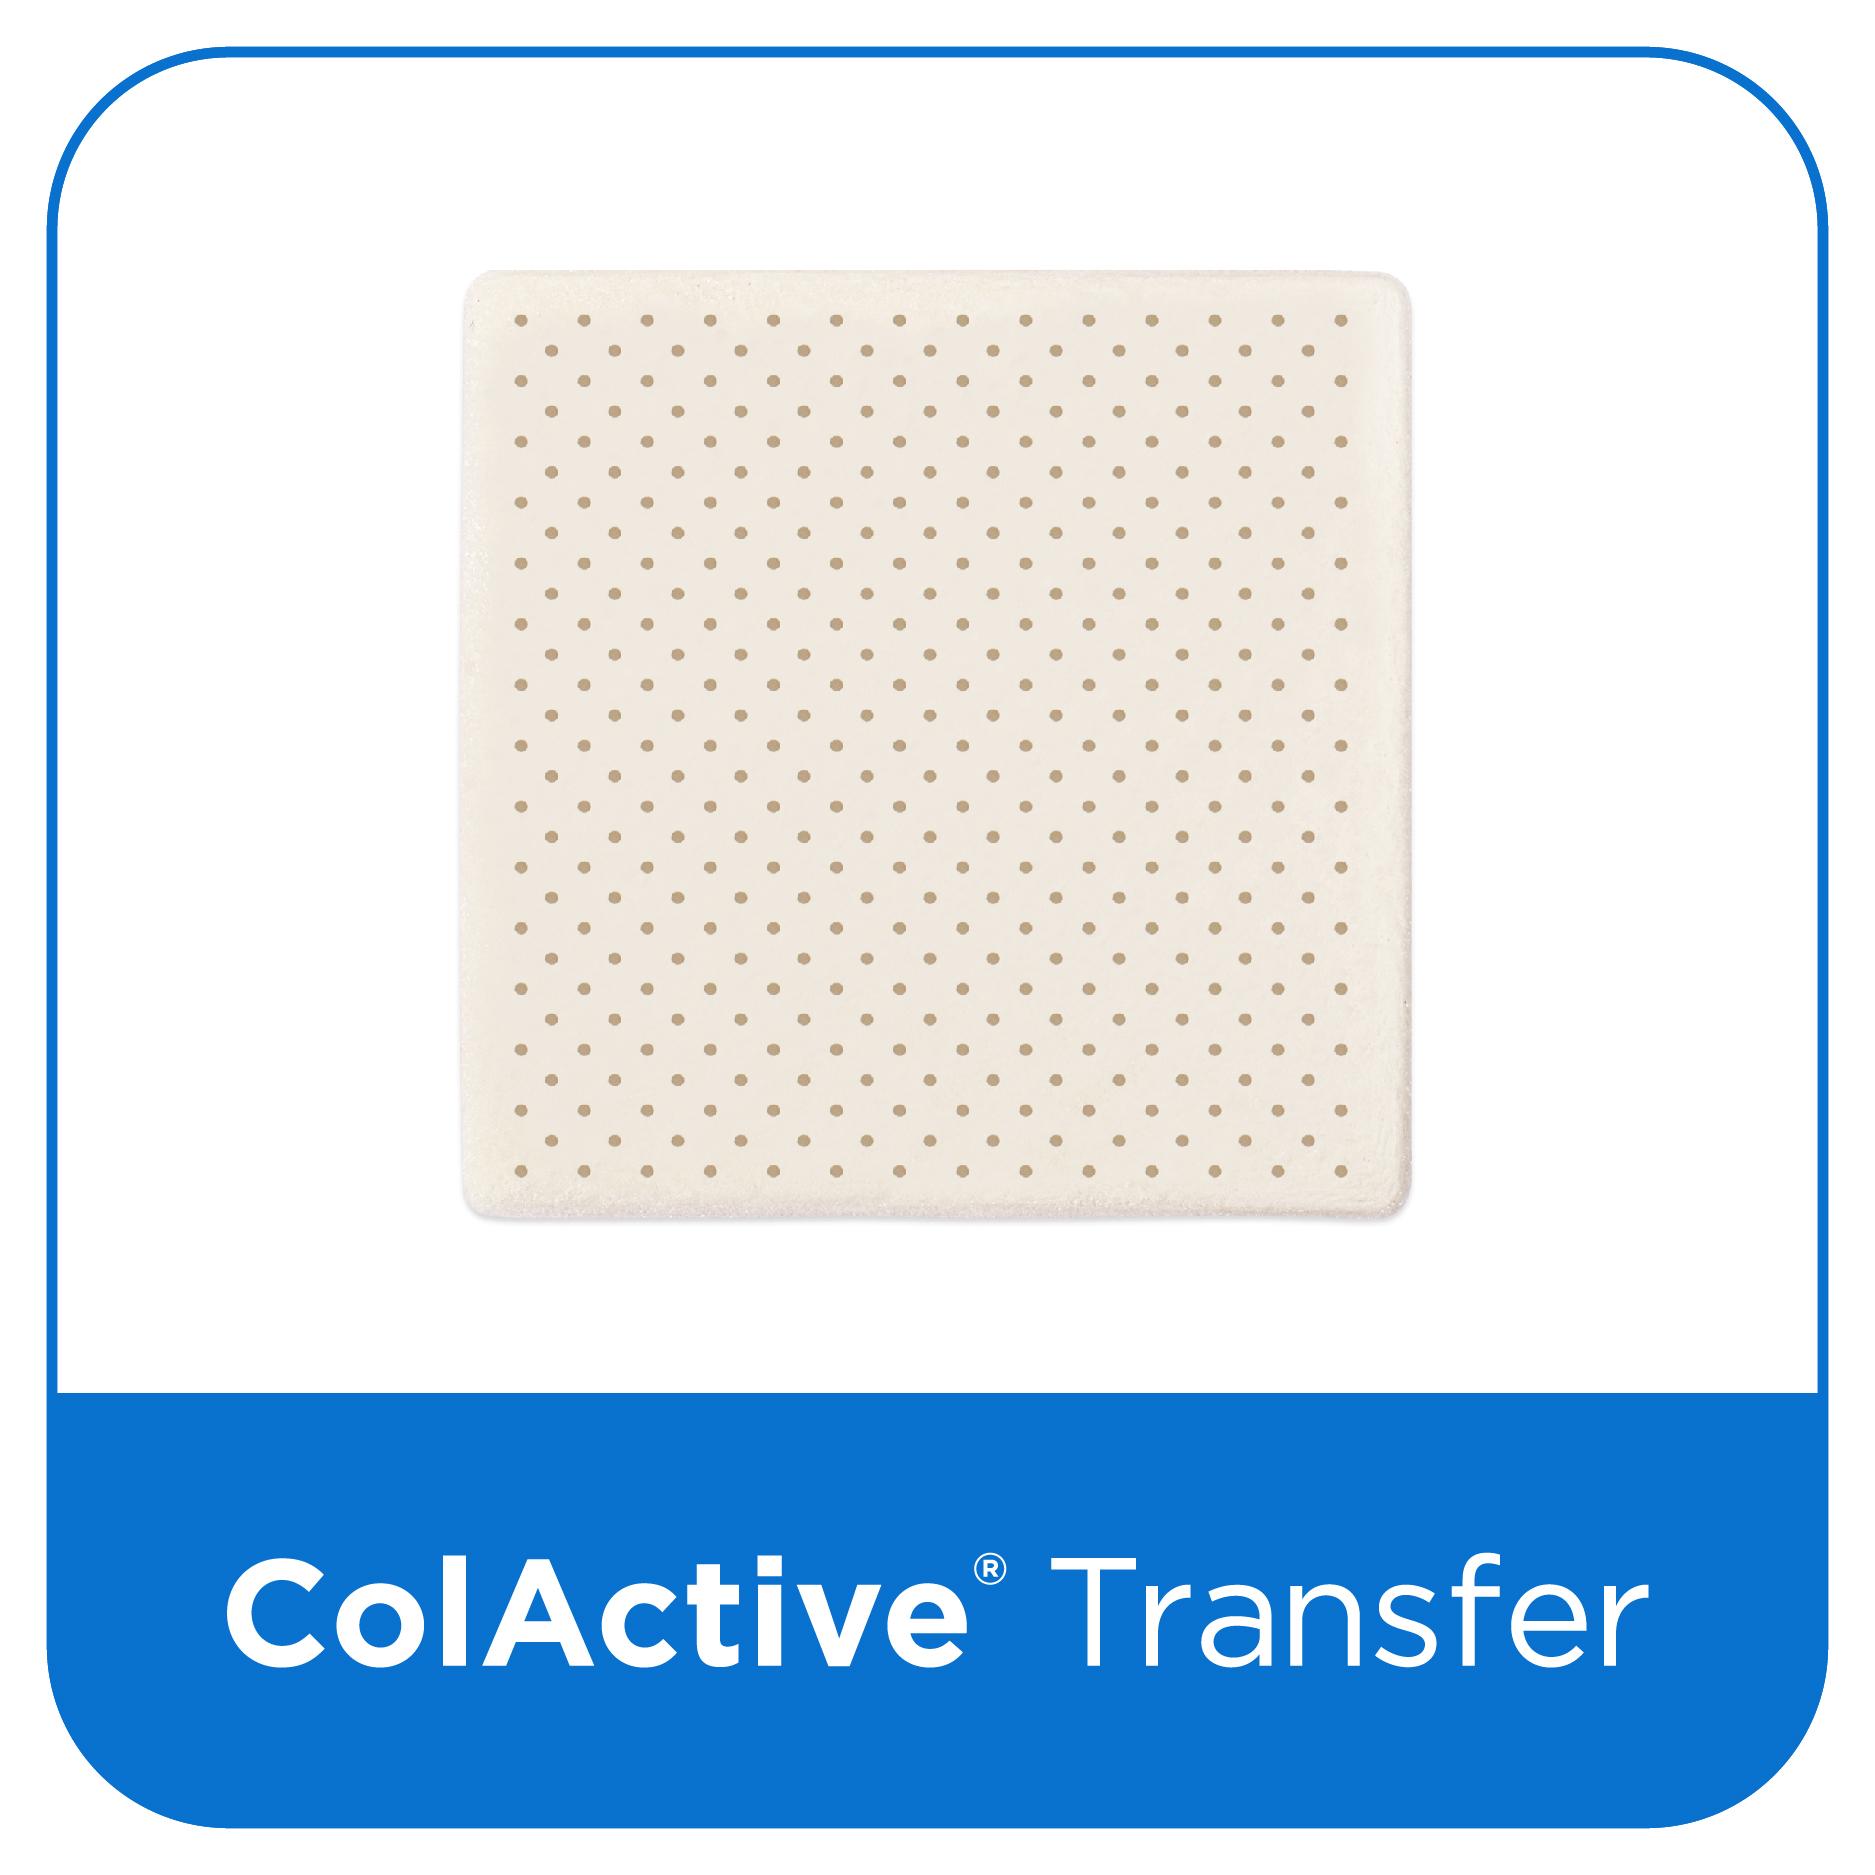 COLACTIVE-TRANSFER